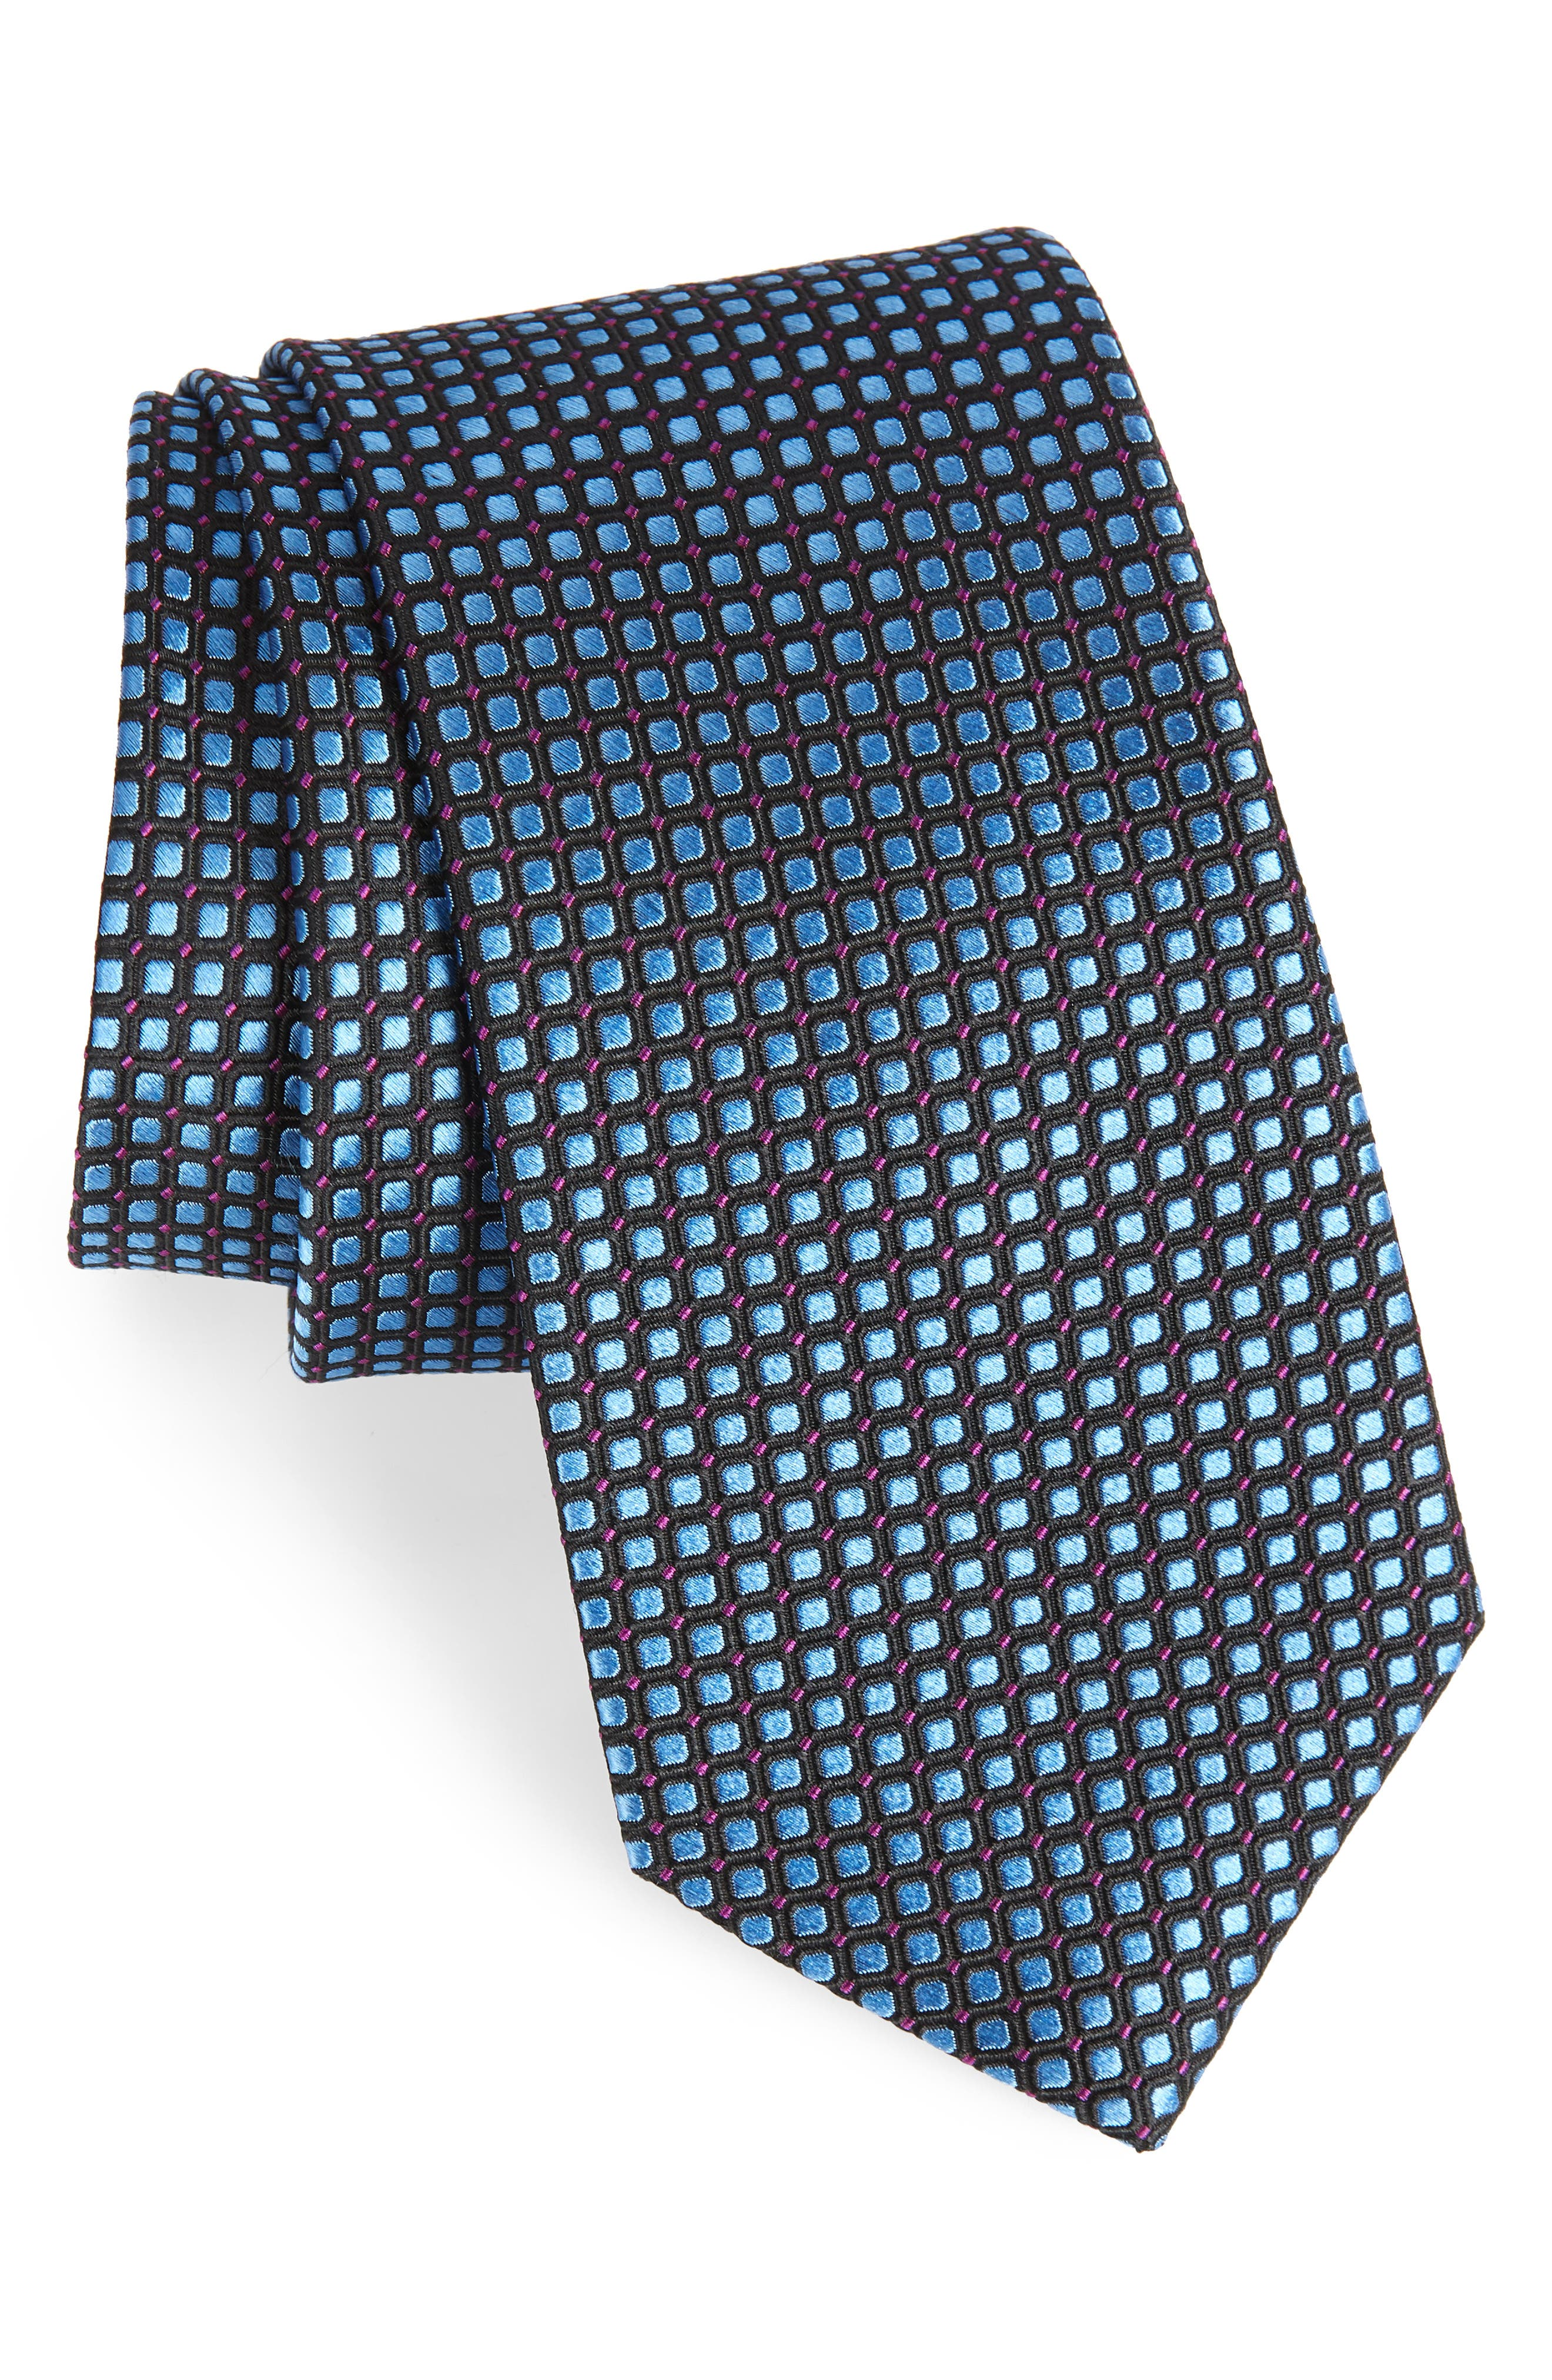 Alternate Image 1 Selected - Nordstrom Men's Shop Laguna Check Silk Tie